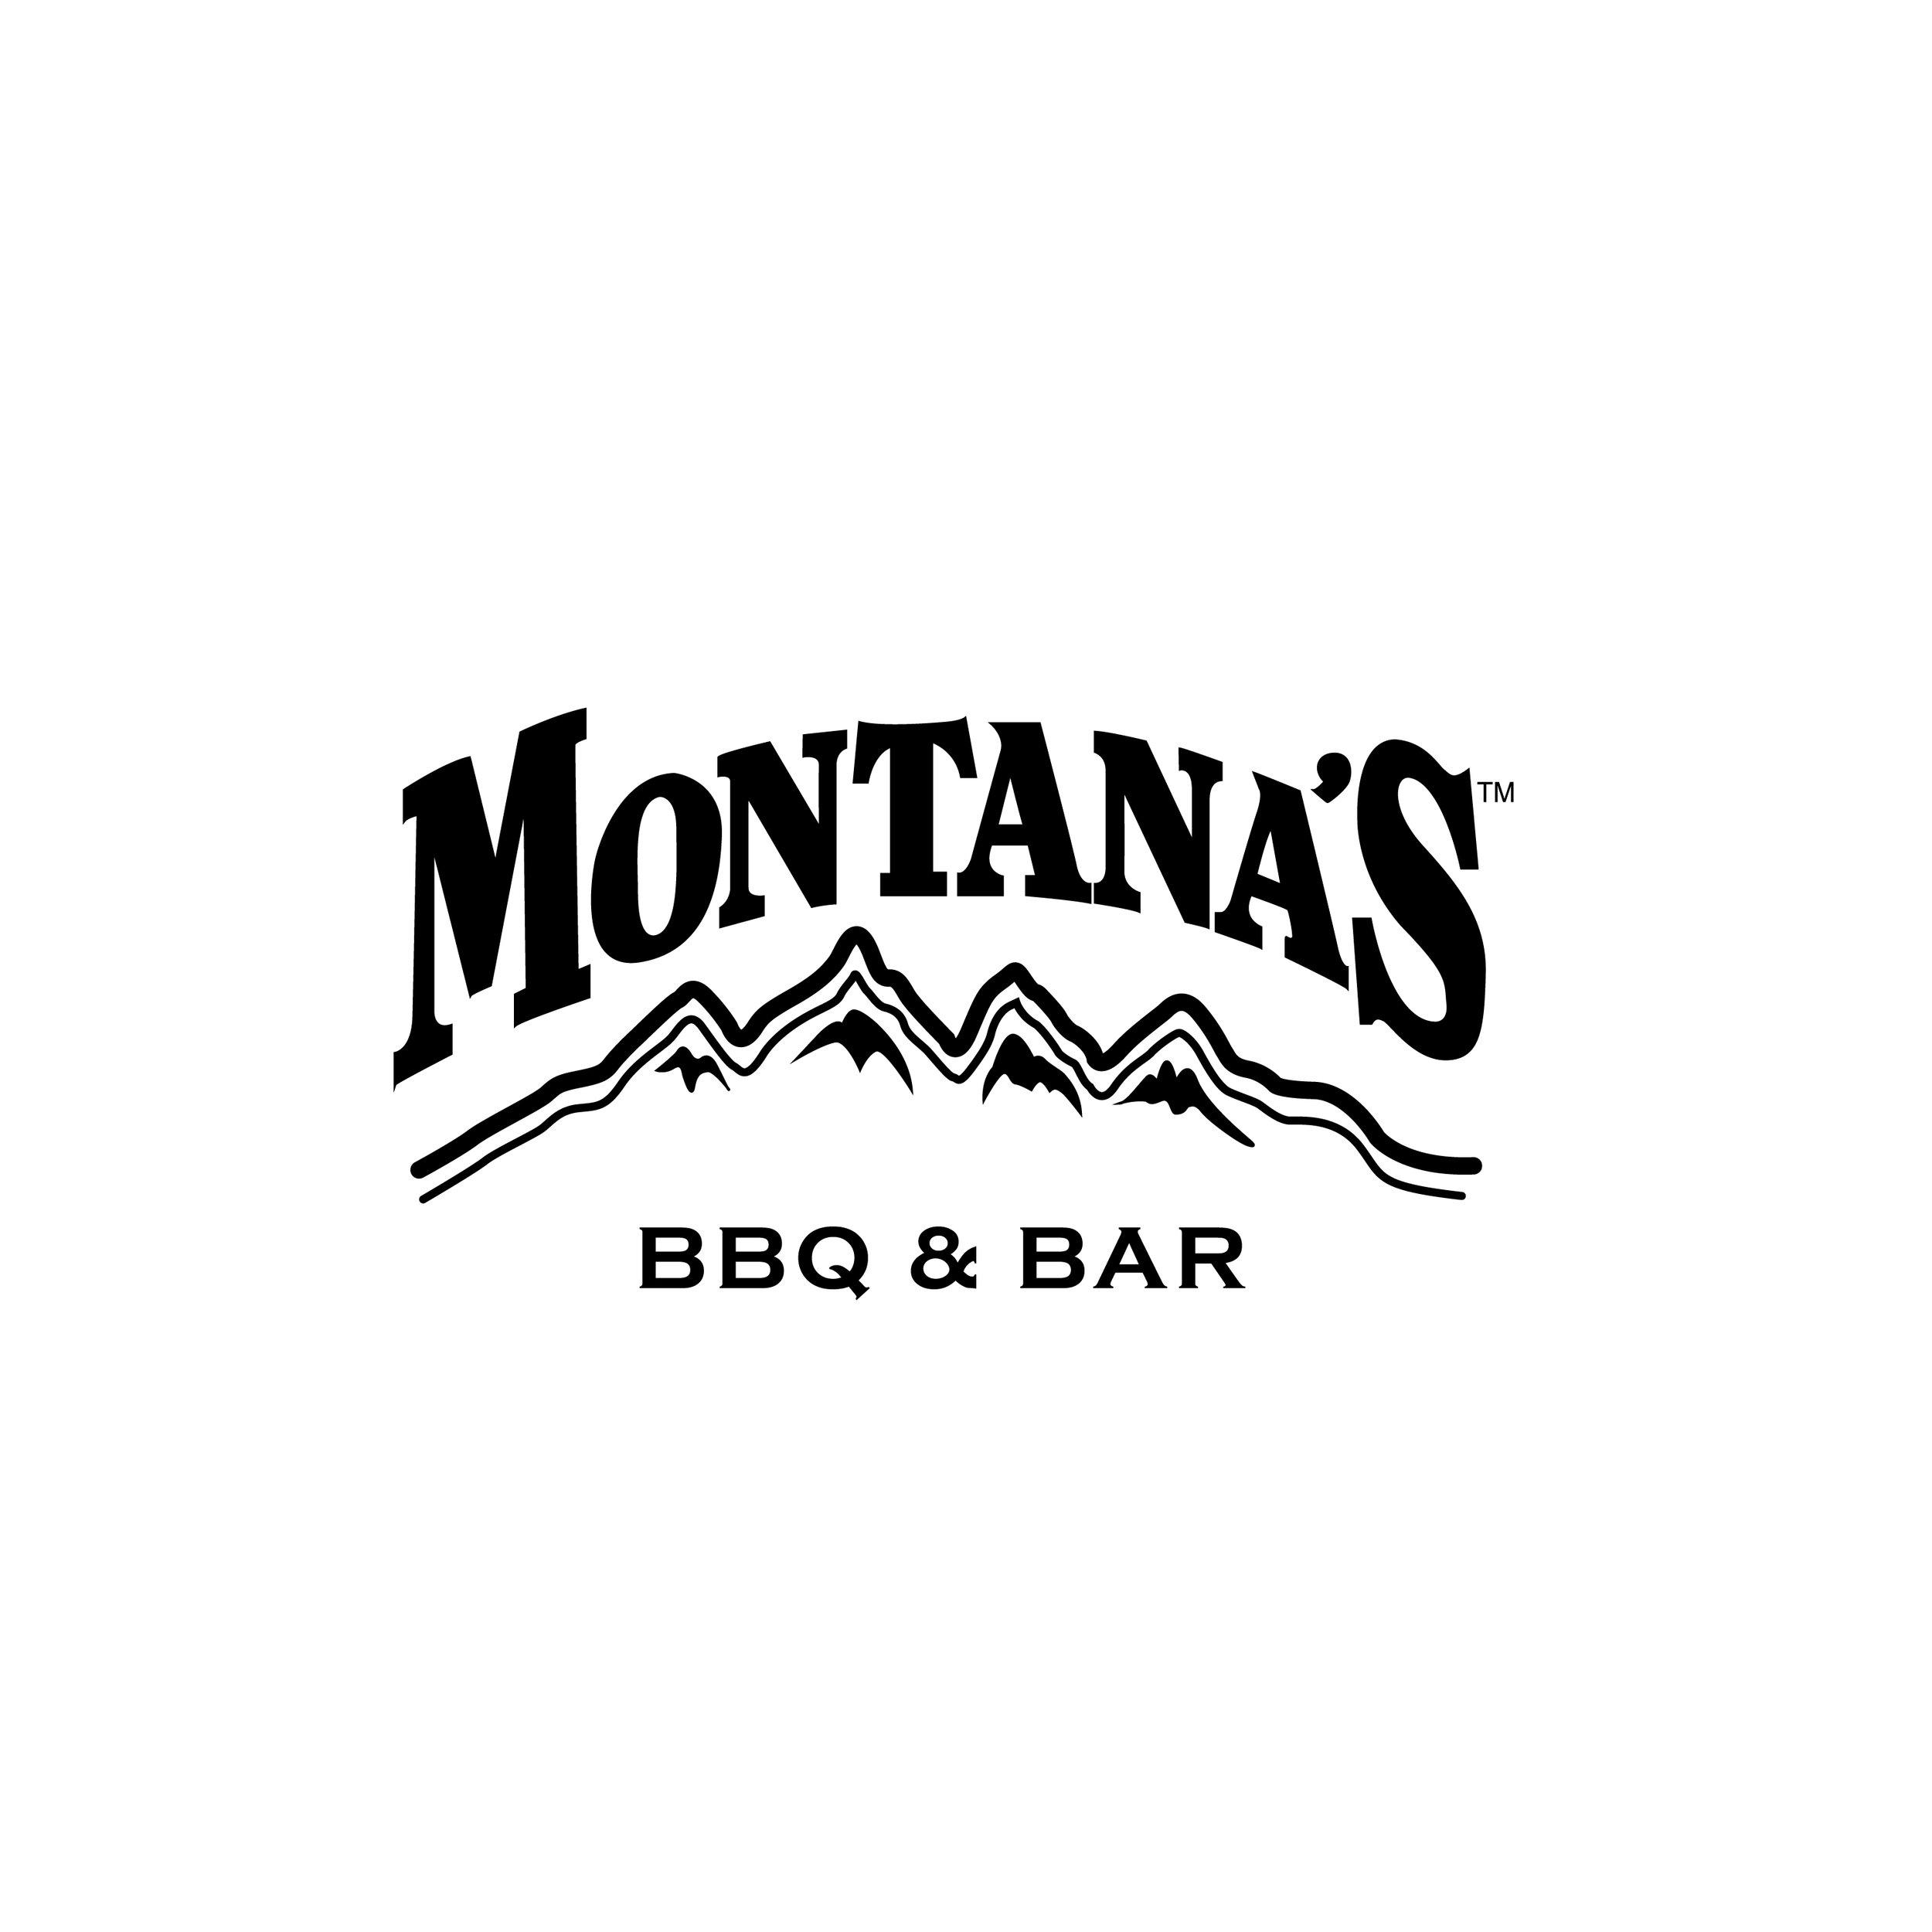 Montanas_Black_Transparent_Vector-01.jpg